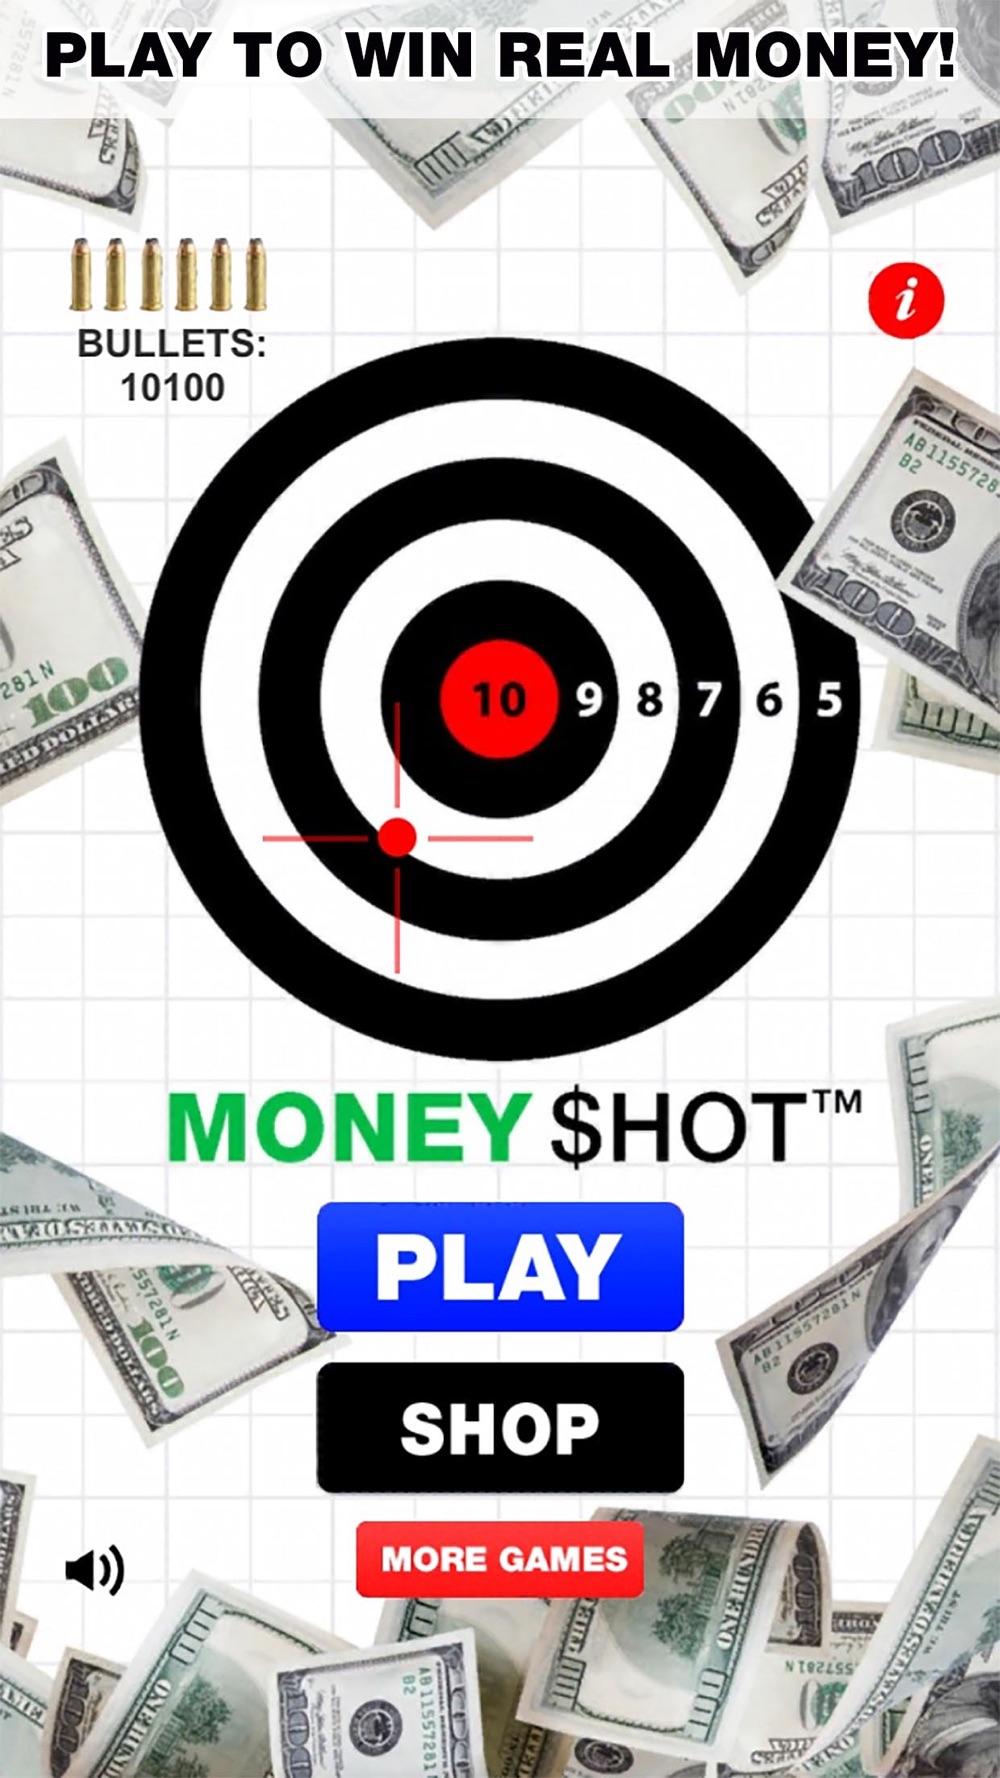 Money $hot™ Skillz: Win Real Money & Prizes Cheat Codes